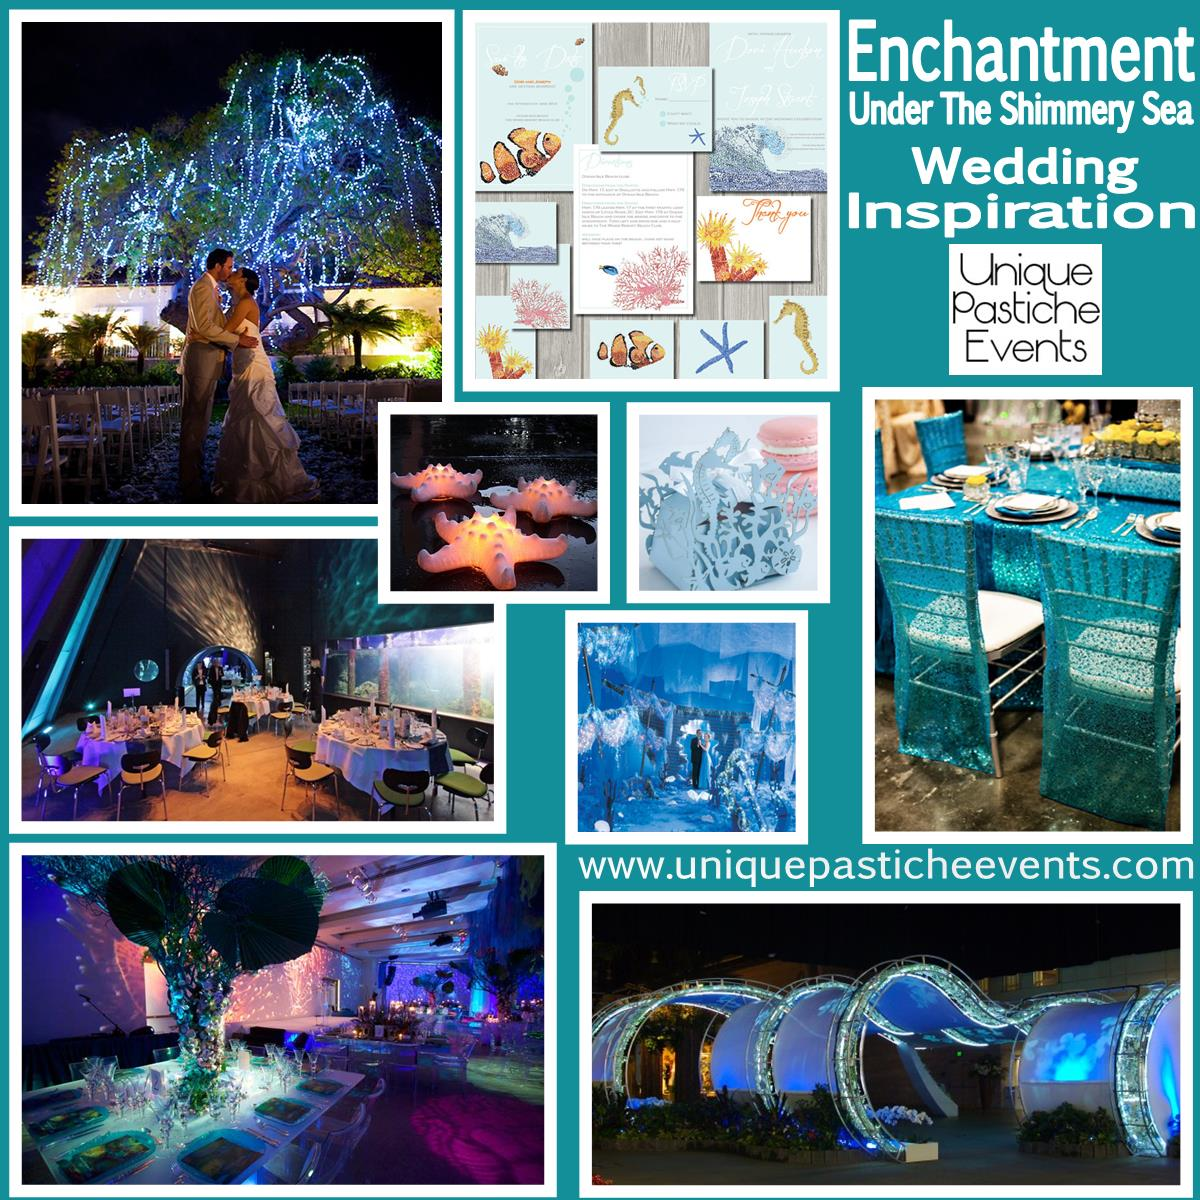 Enchantment Under The Shimmery Sea Wedding Inspiration